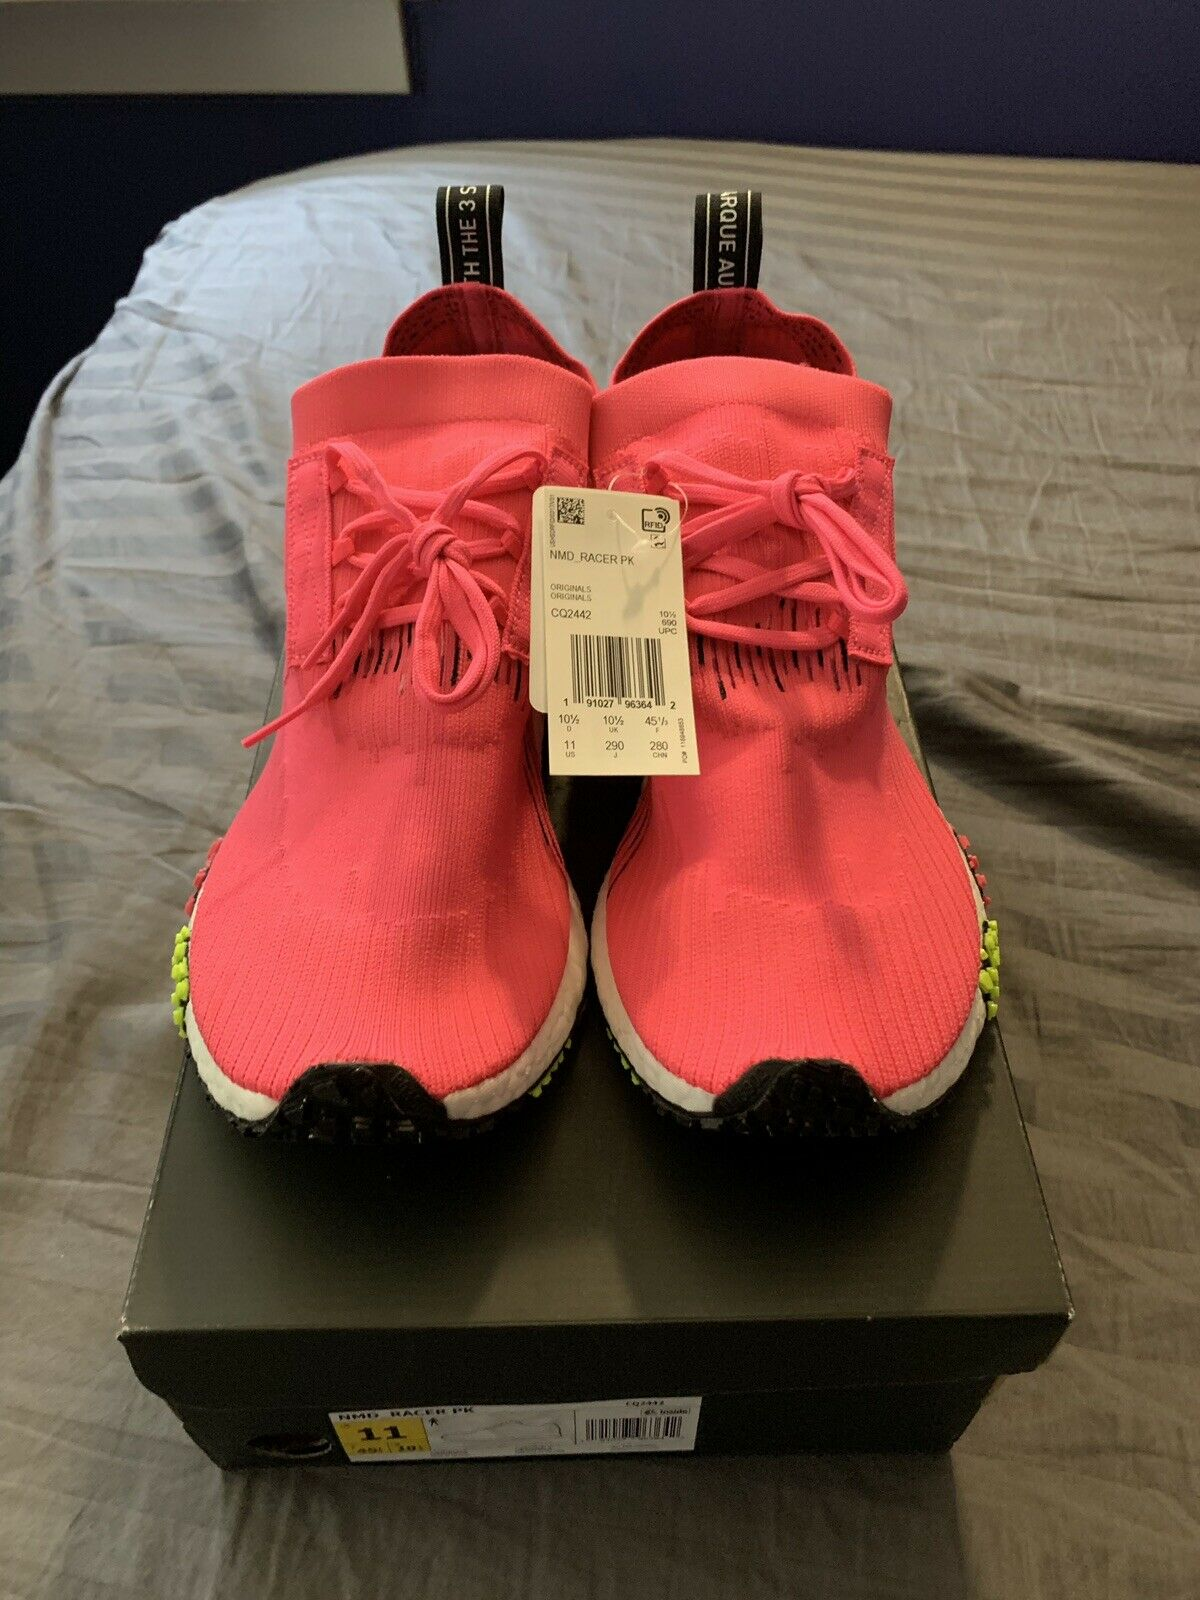 Adidas Originals Nmd Racer Pk Primeknit Boost Solar Pink Men Running shoes CQ2442